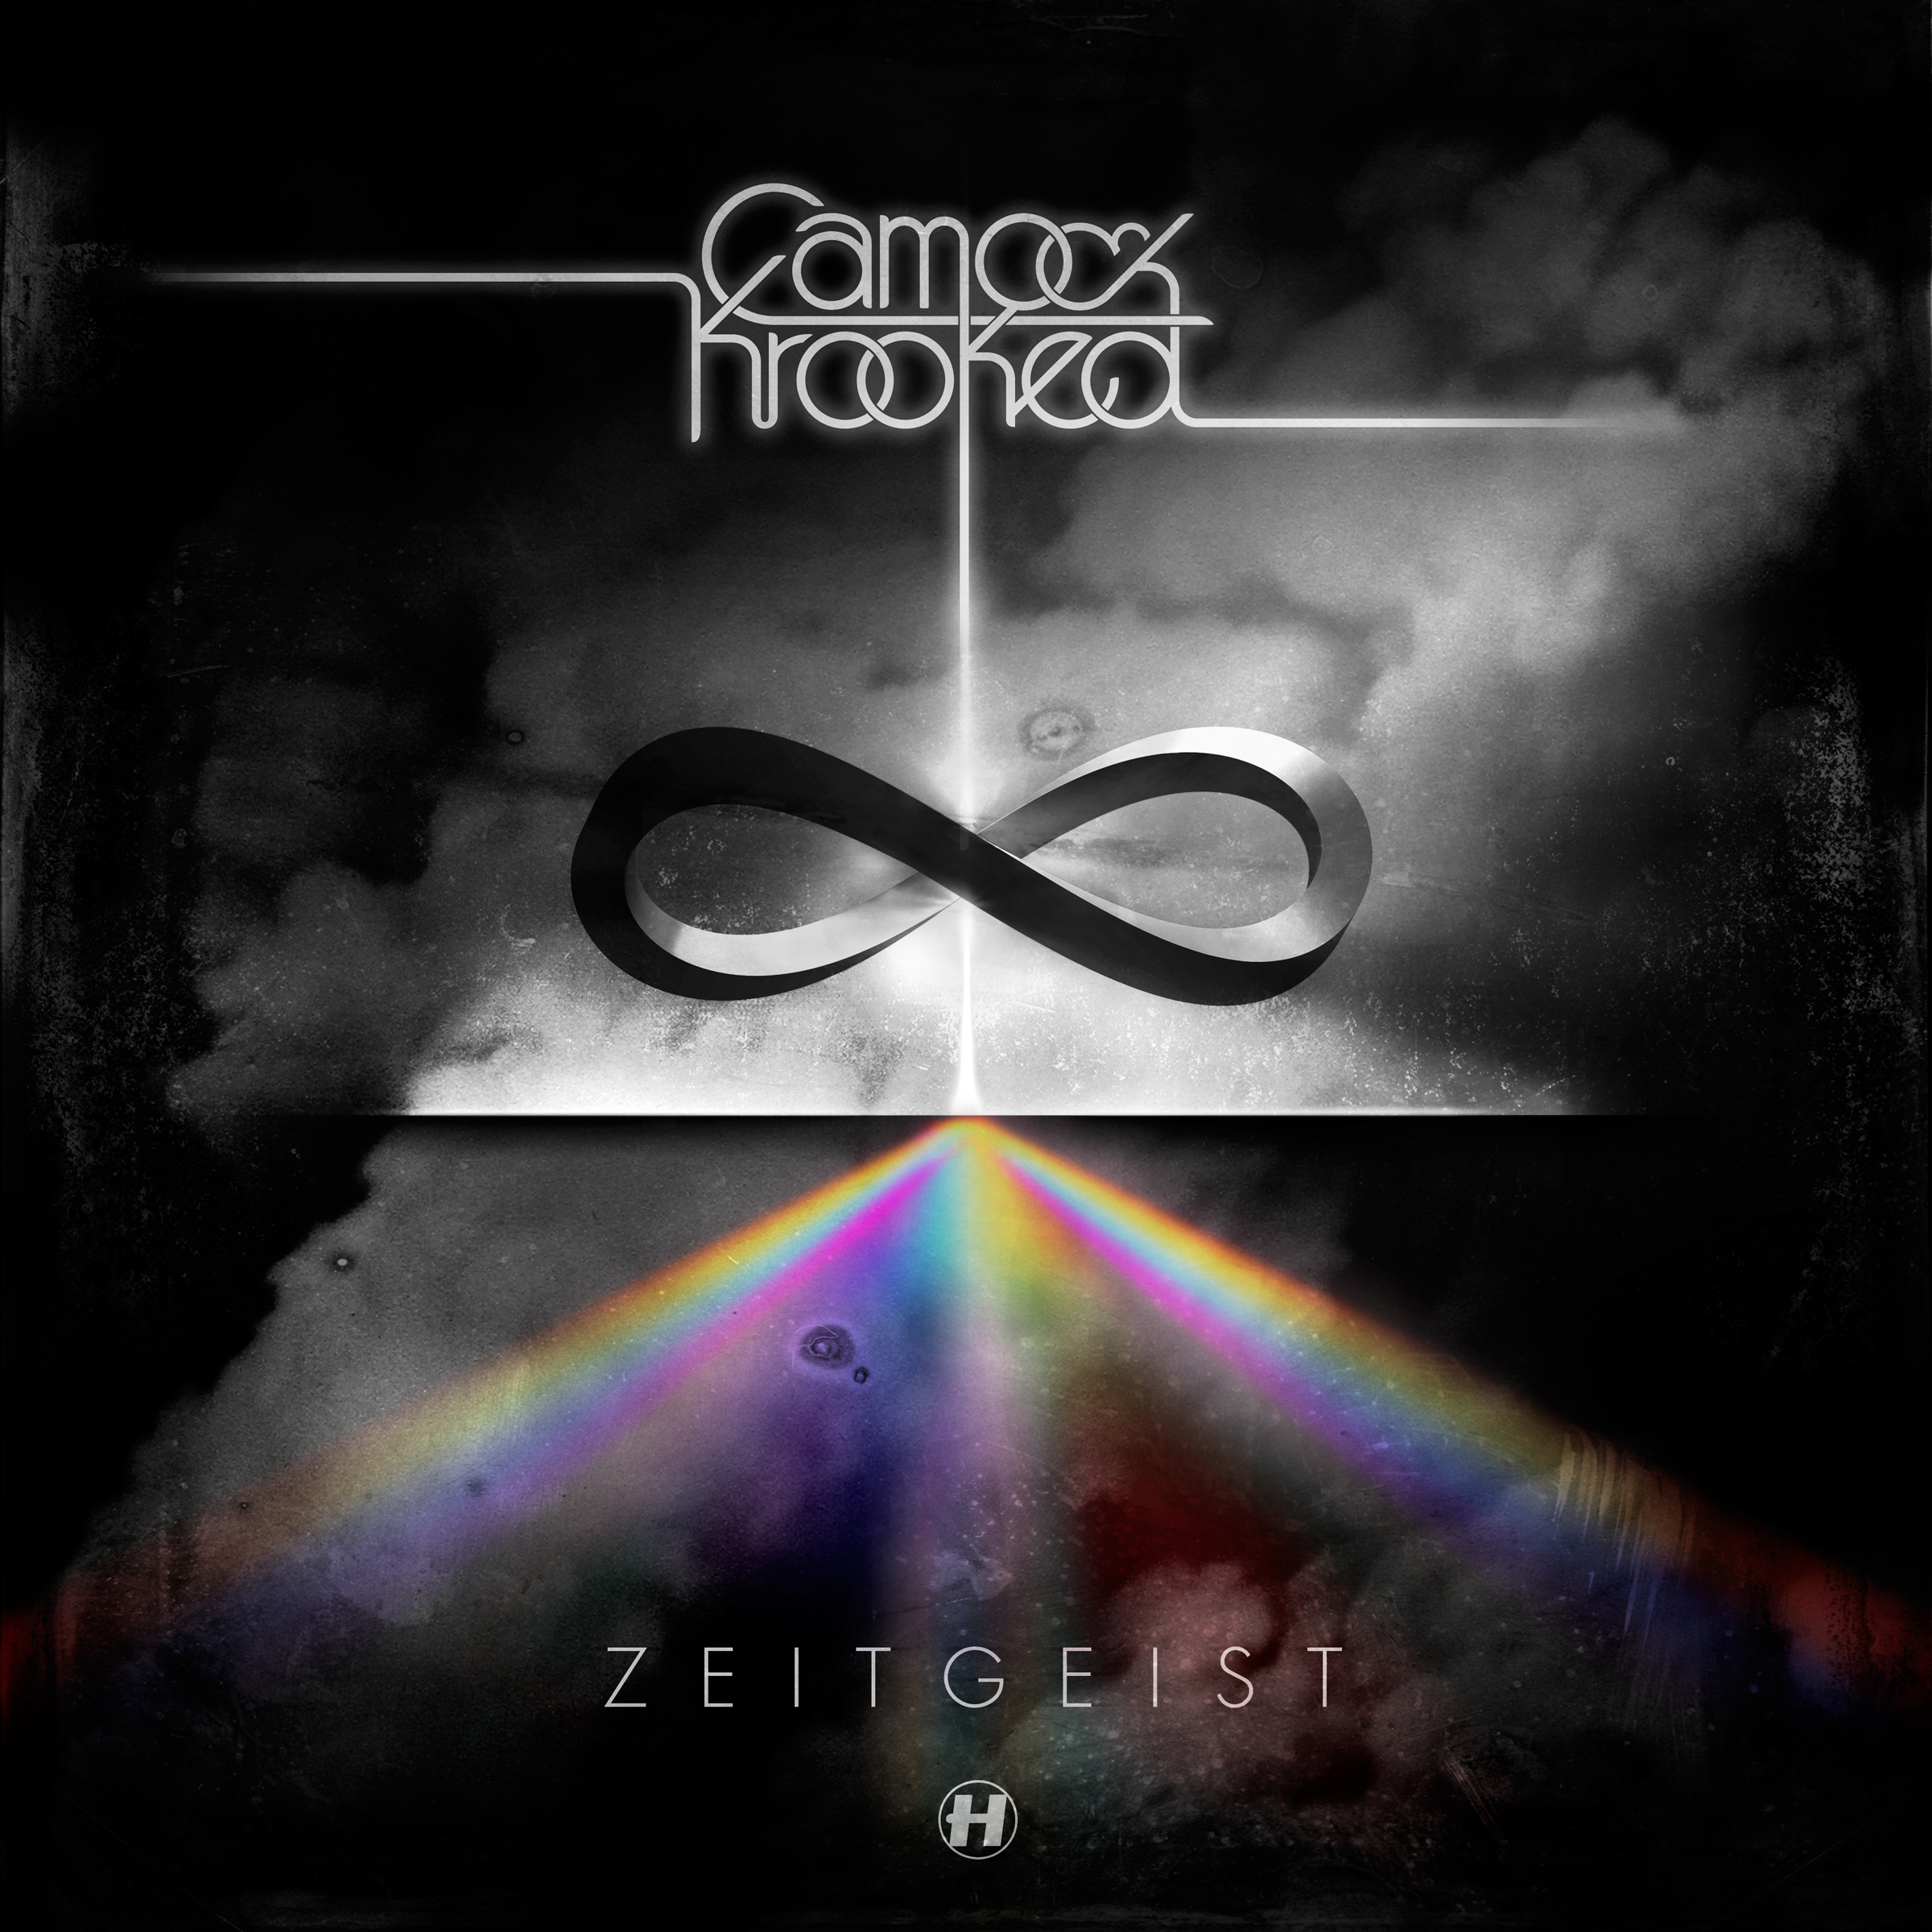 Camo & Krooked/ZEITGEIST DLP